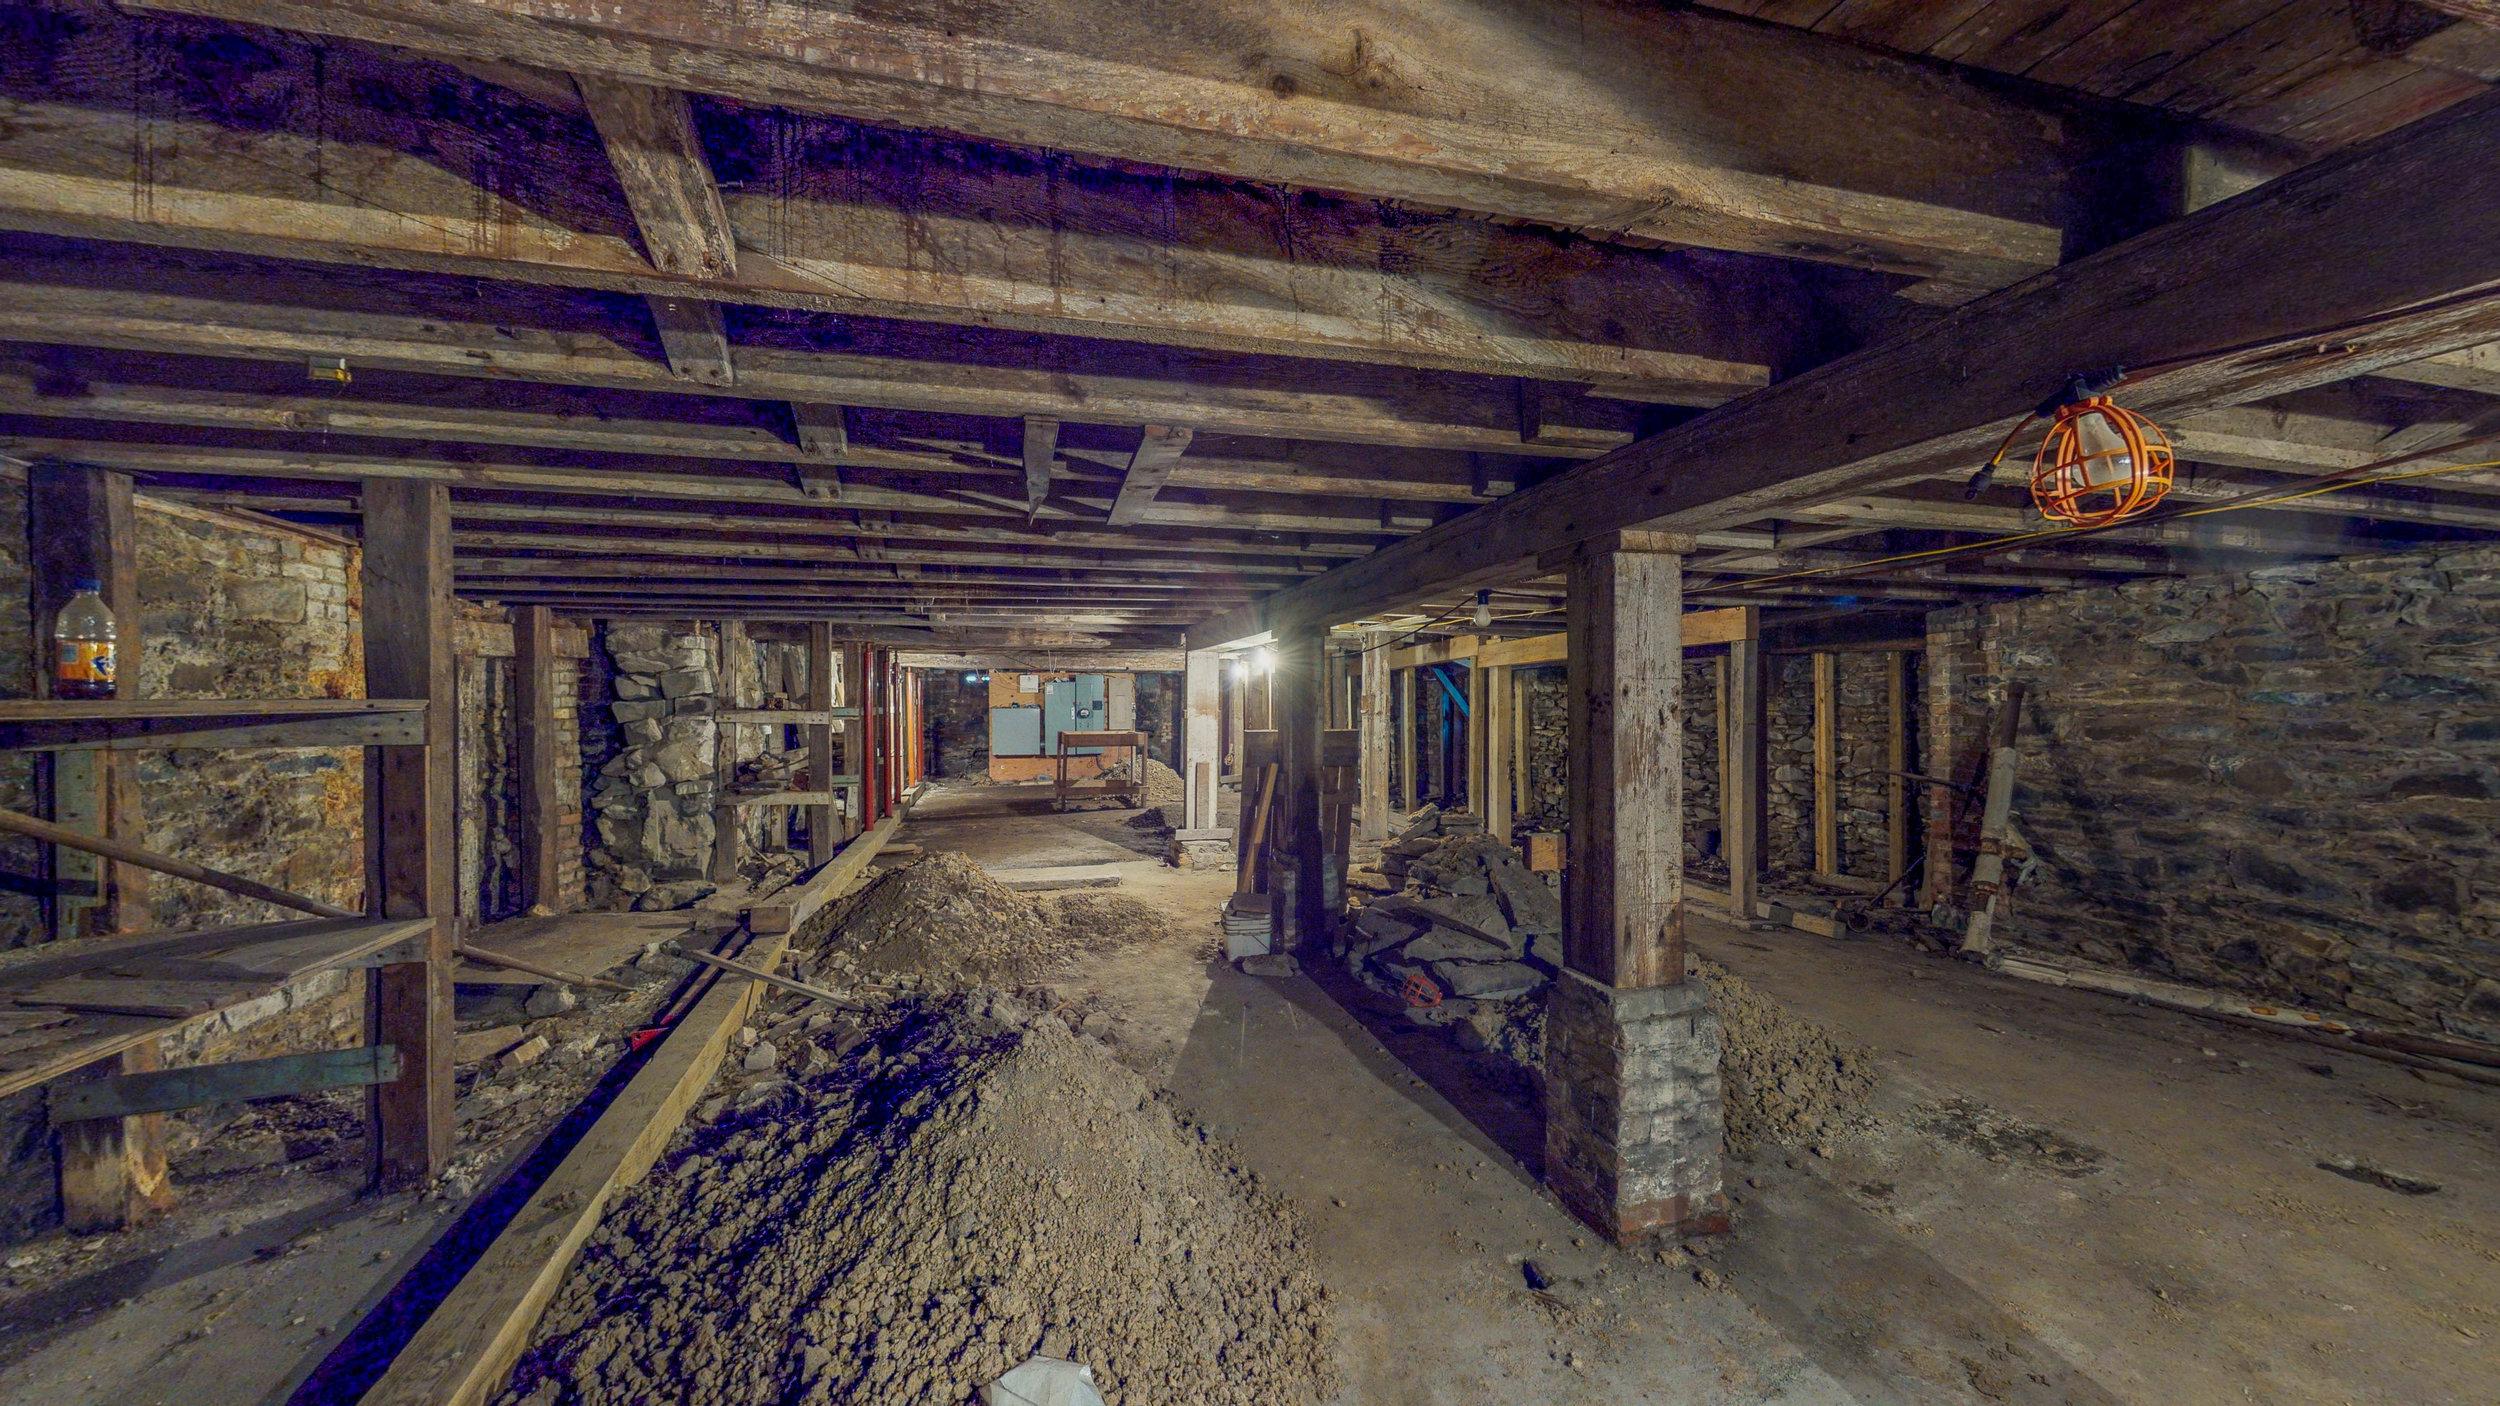 The-Van-Ostrande-Radliff-House-at-48-Hudson-08292019_131950.jpg